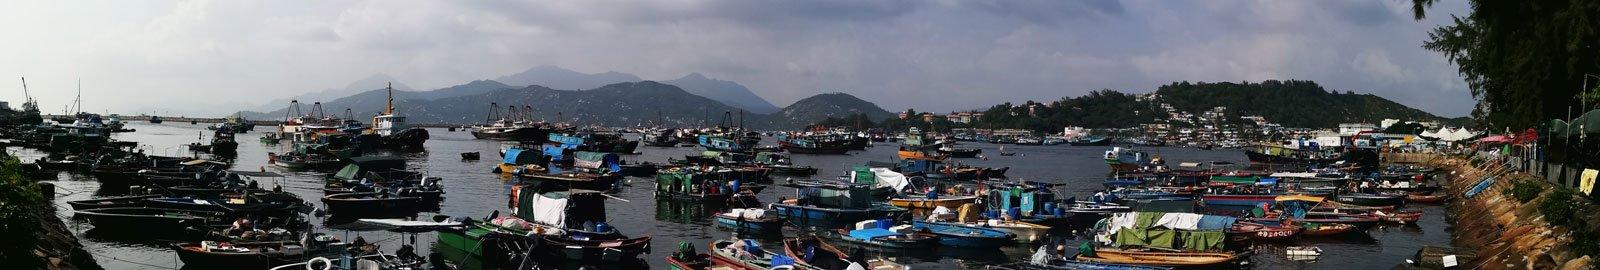 Island of Cheung Chau